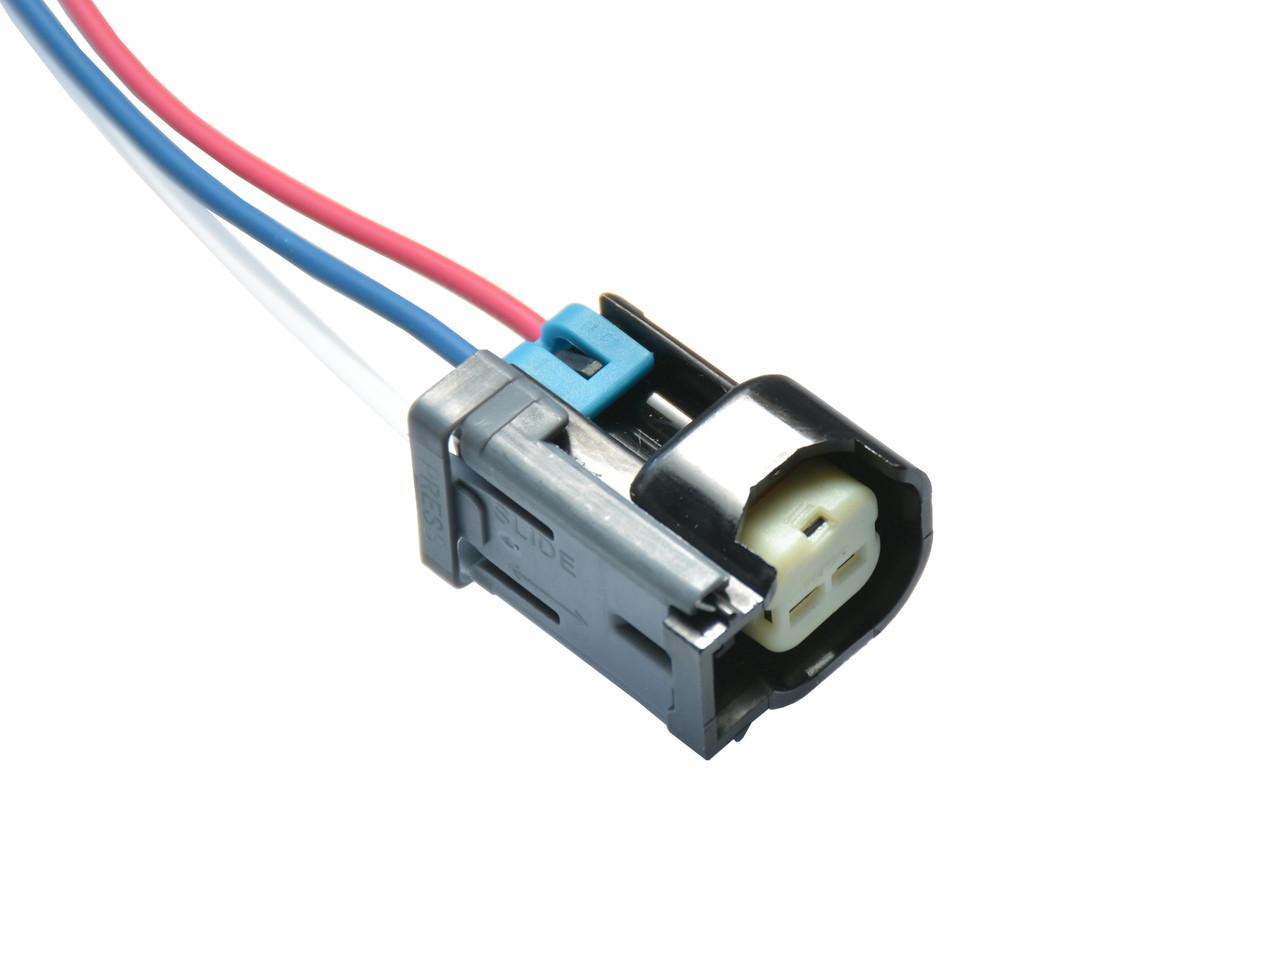 Wholesale Lot 2000 GM Ford EV6 USCAR Molex MX150 Series Fuel Injector Connectors